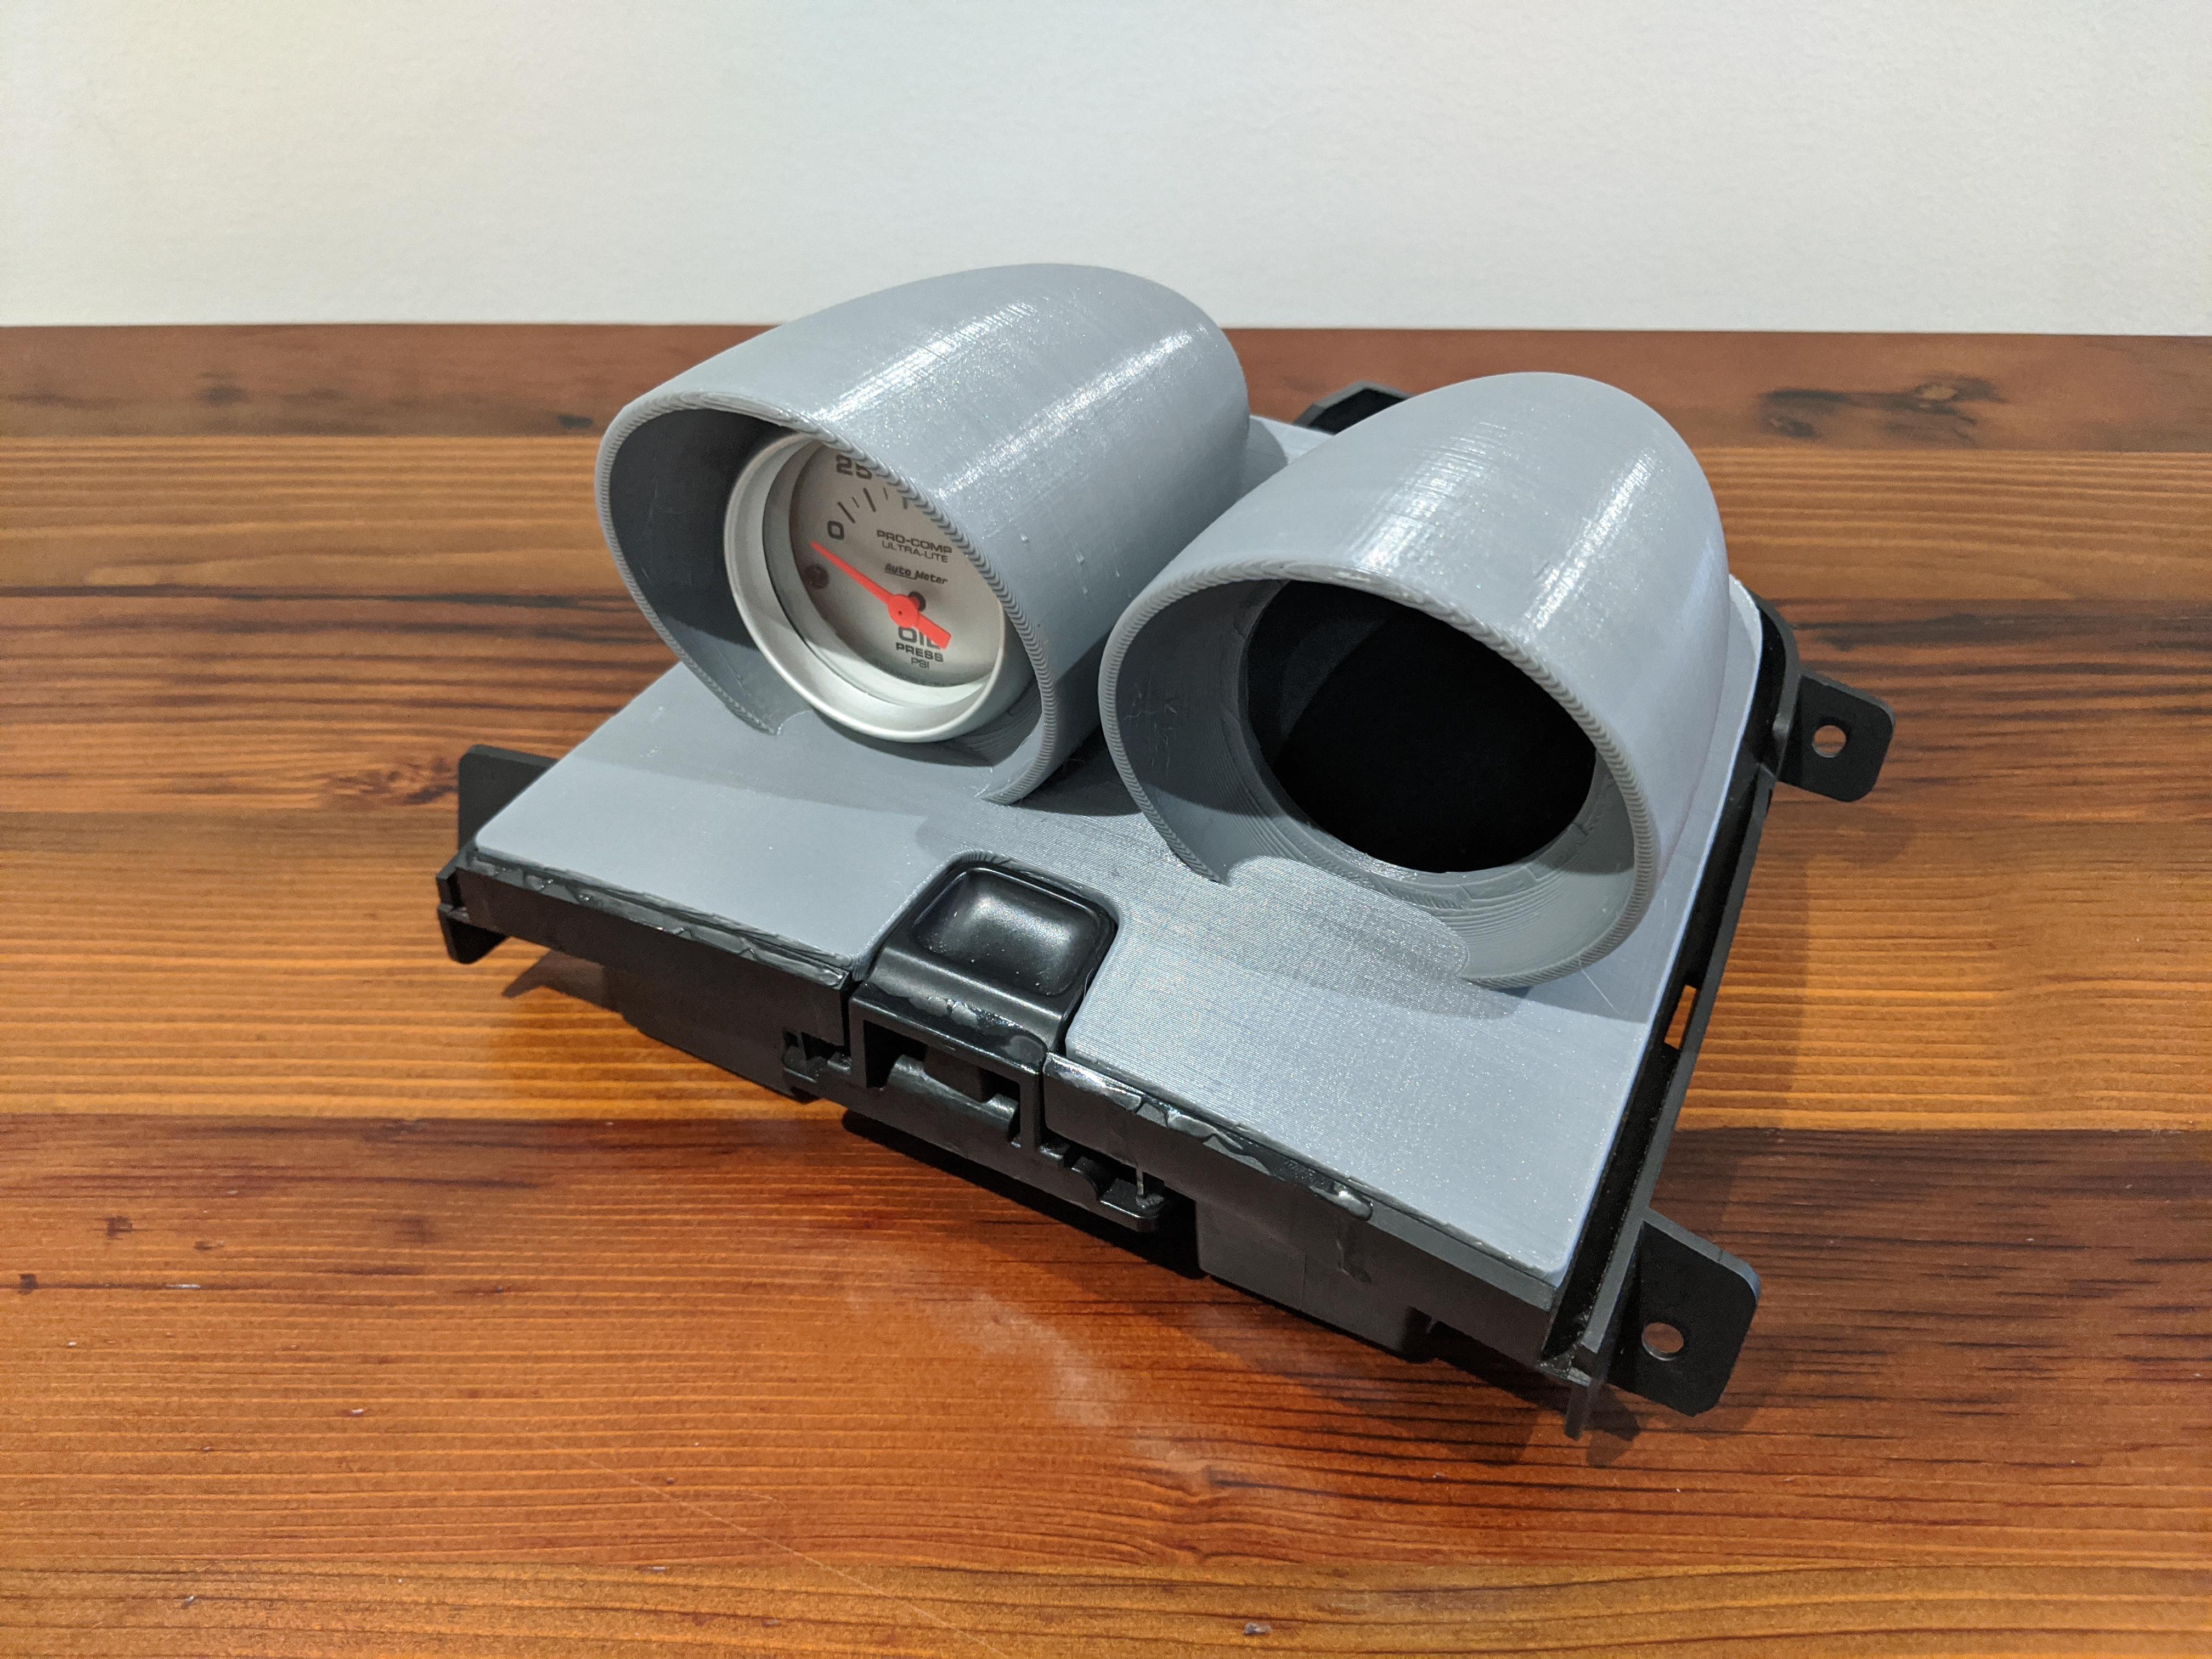 Prototype of an automotive gauge pod